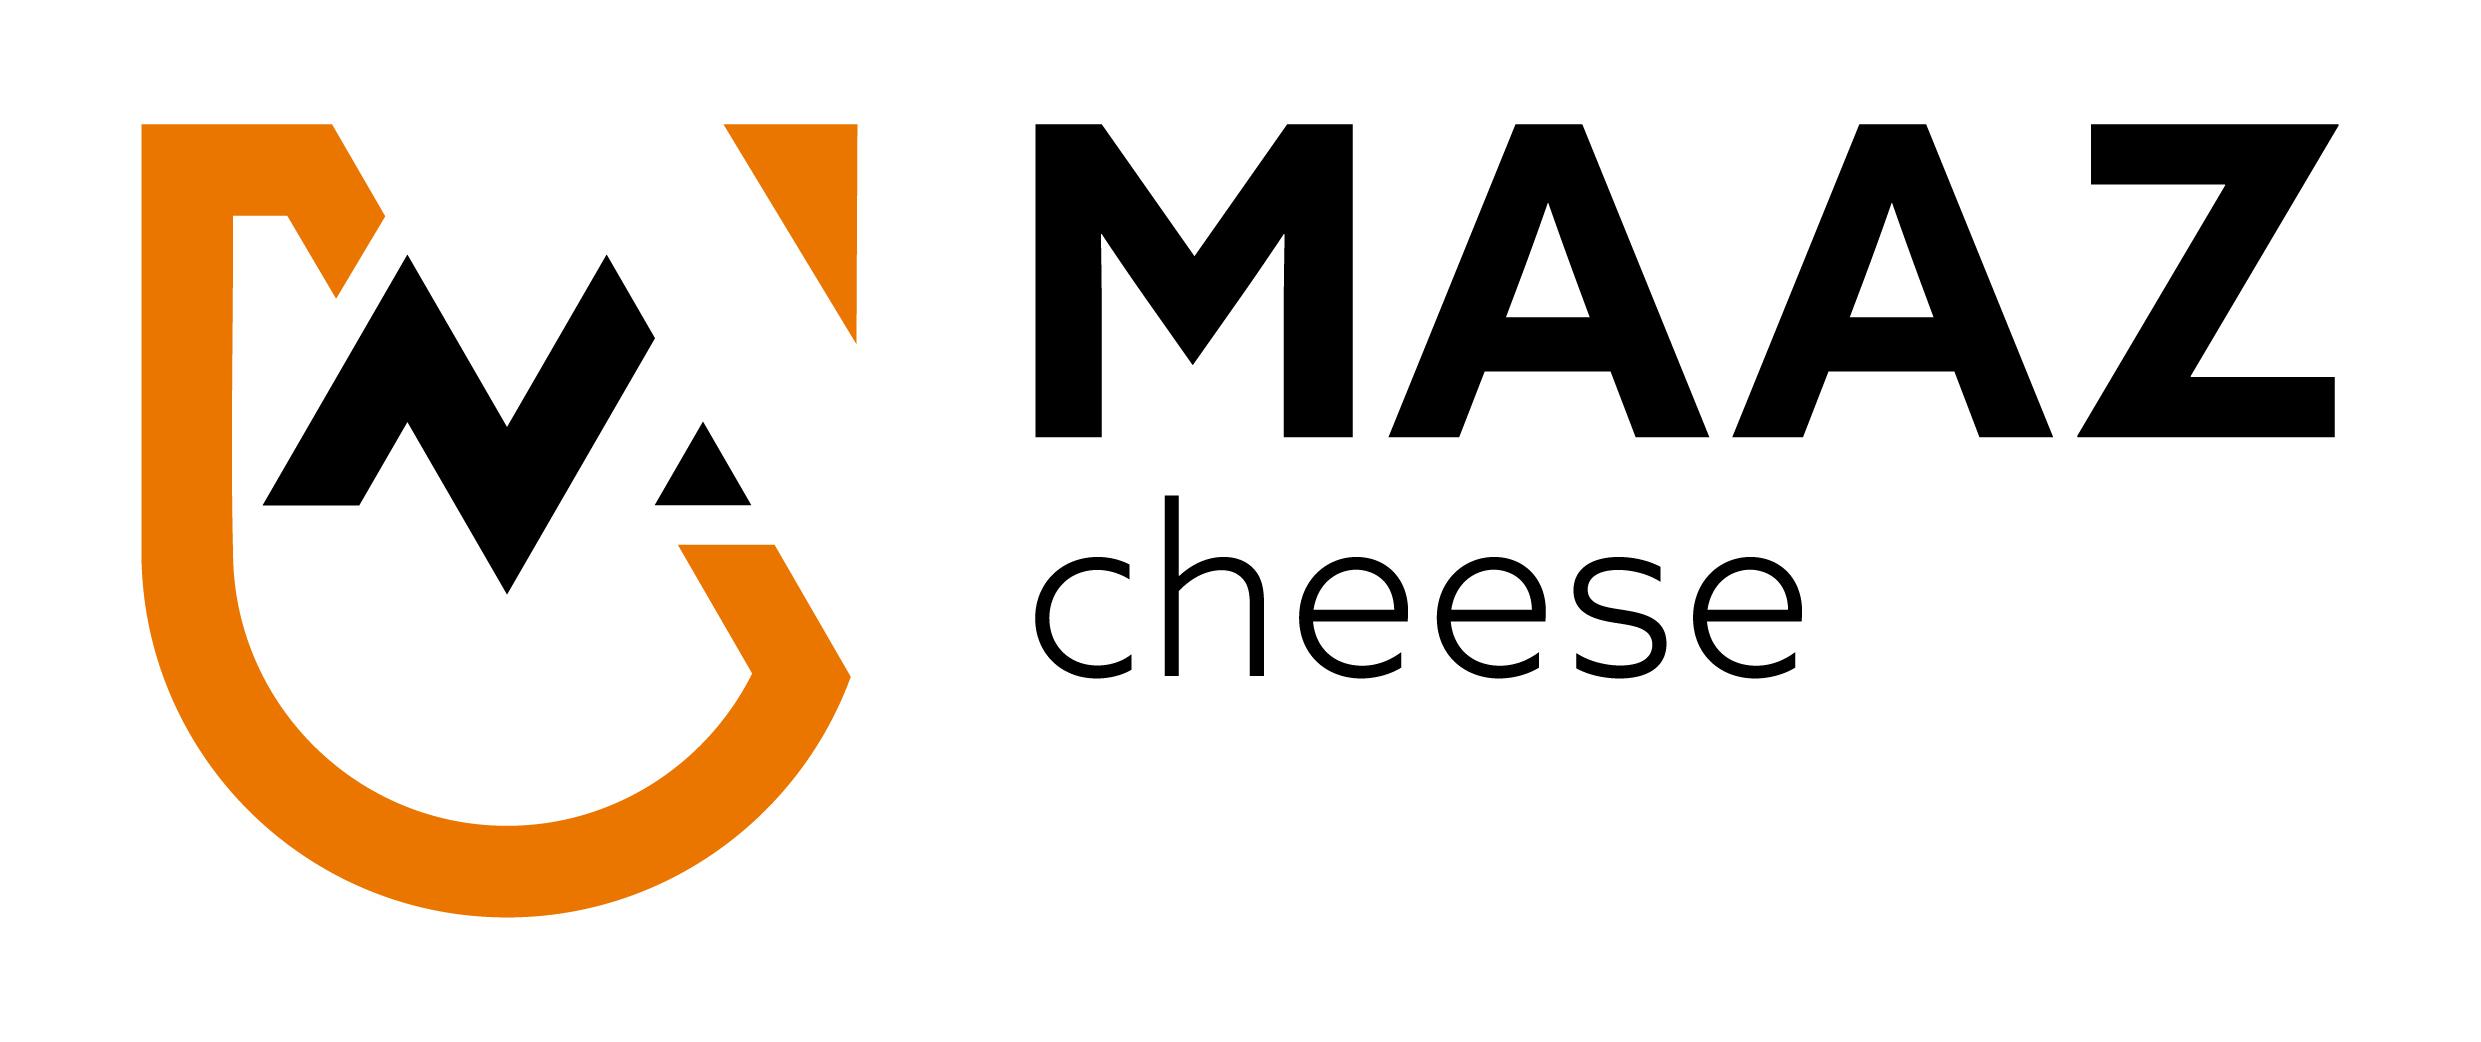 MAAZ Cheese